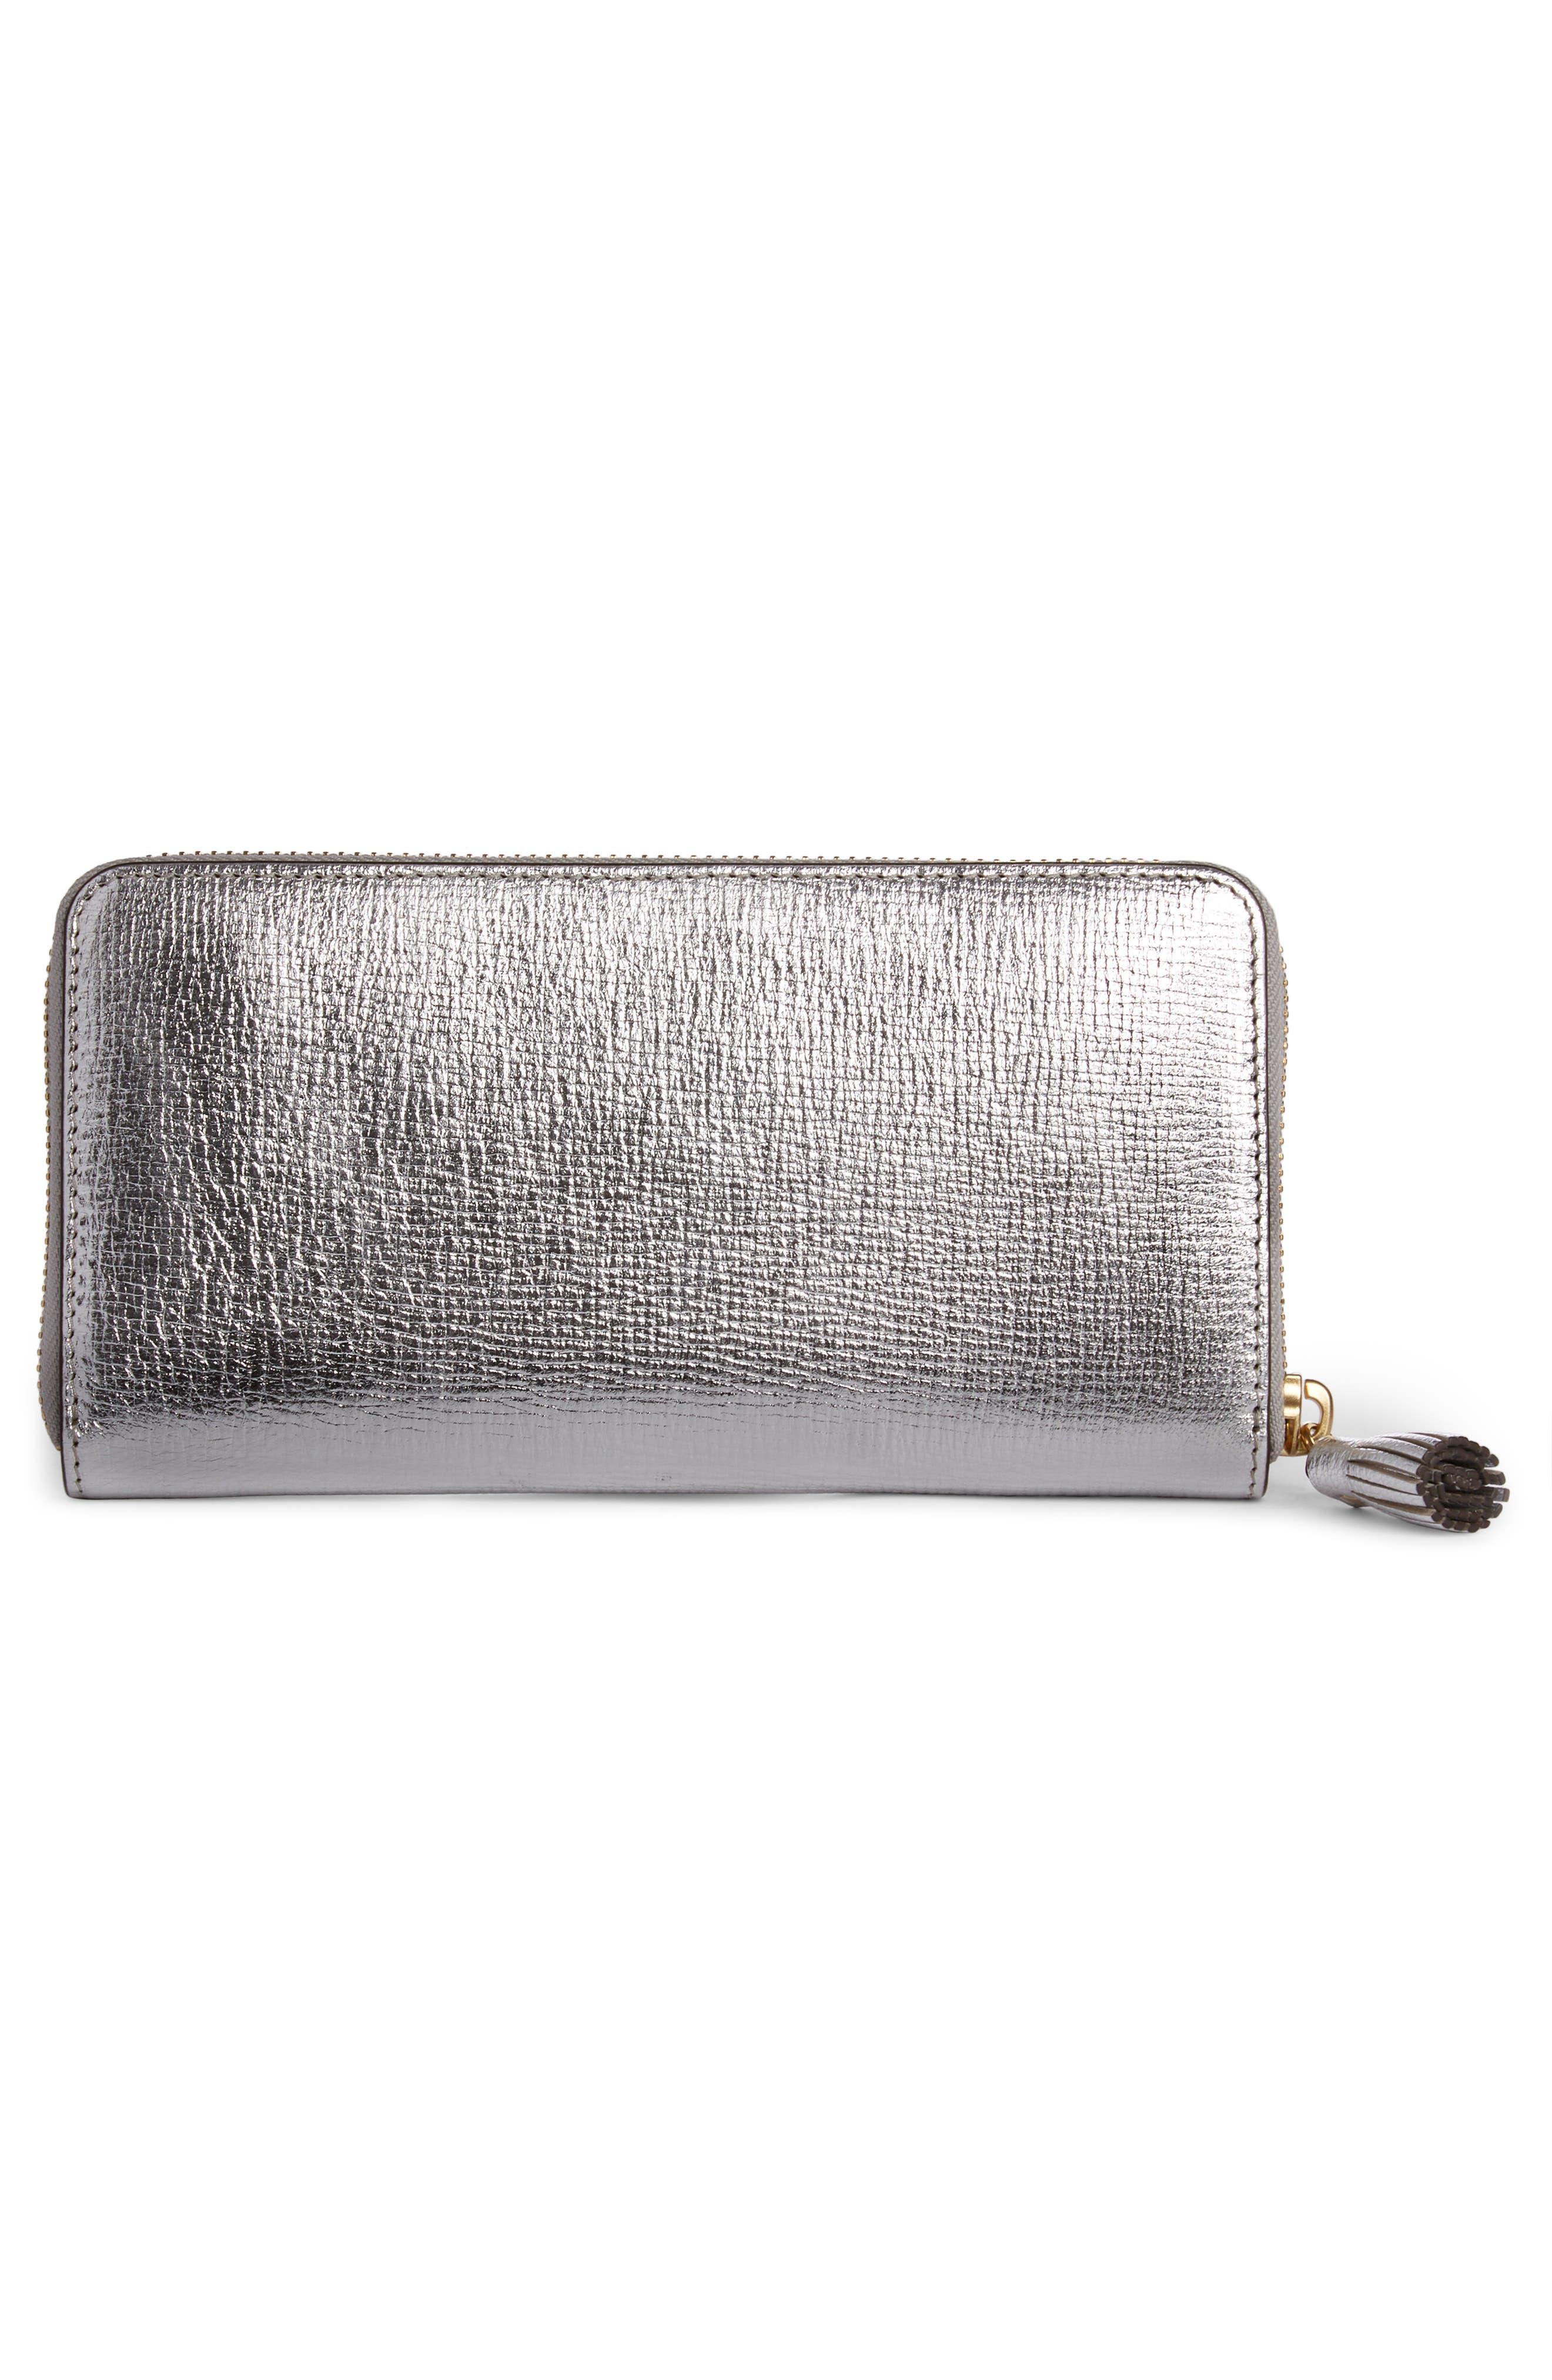 Eyes Large Metallic Leather Zip Around Wallet,                             Alternate thumbnail 3, color,                             SILVER